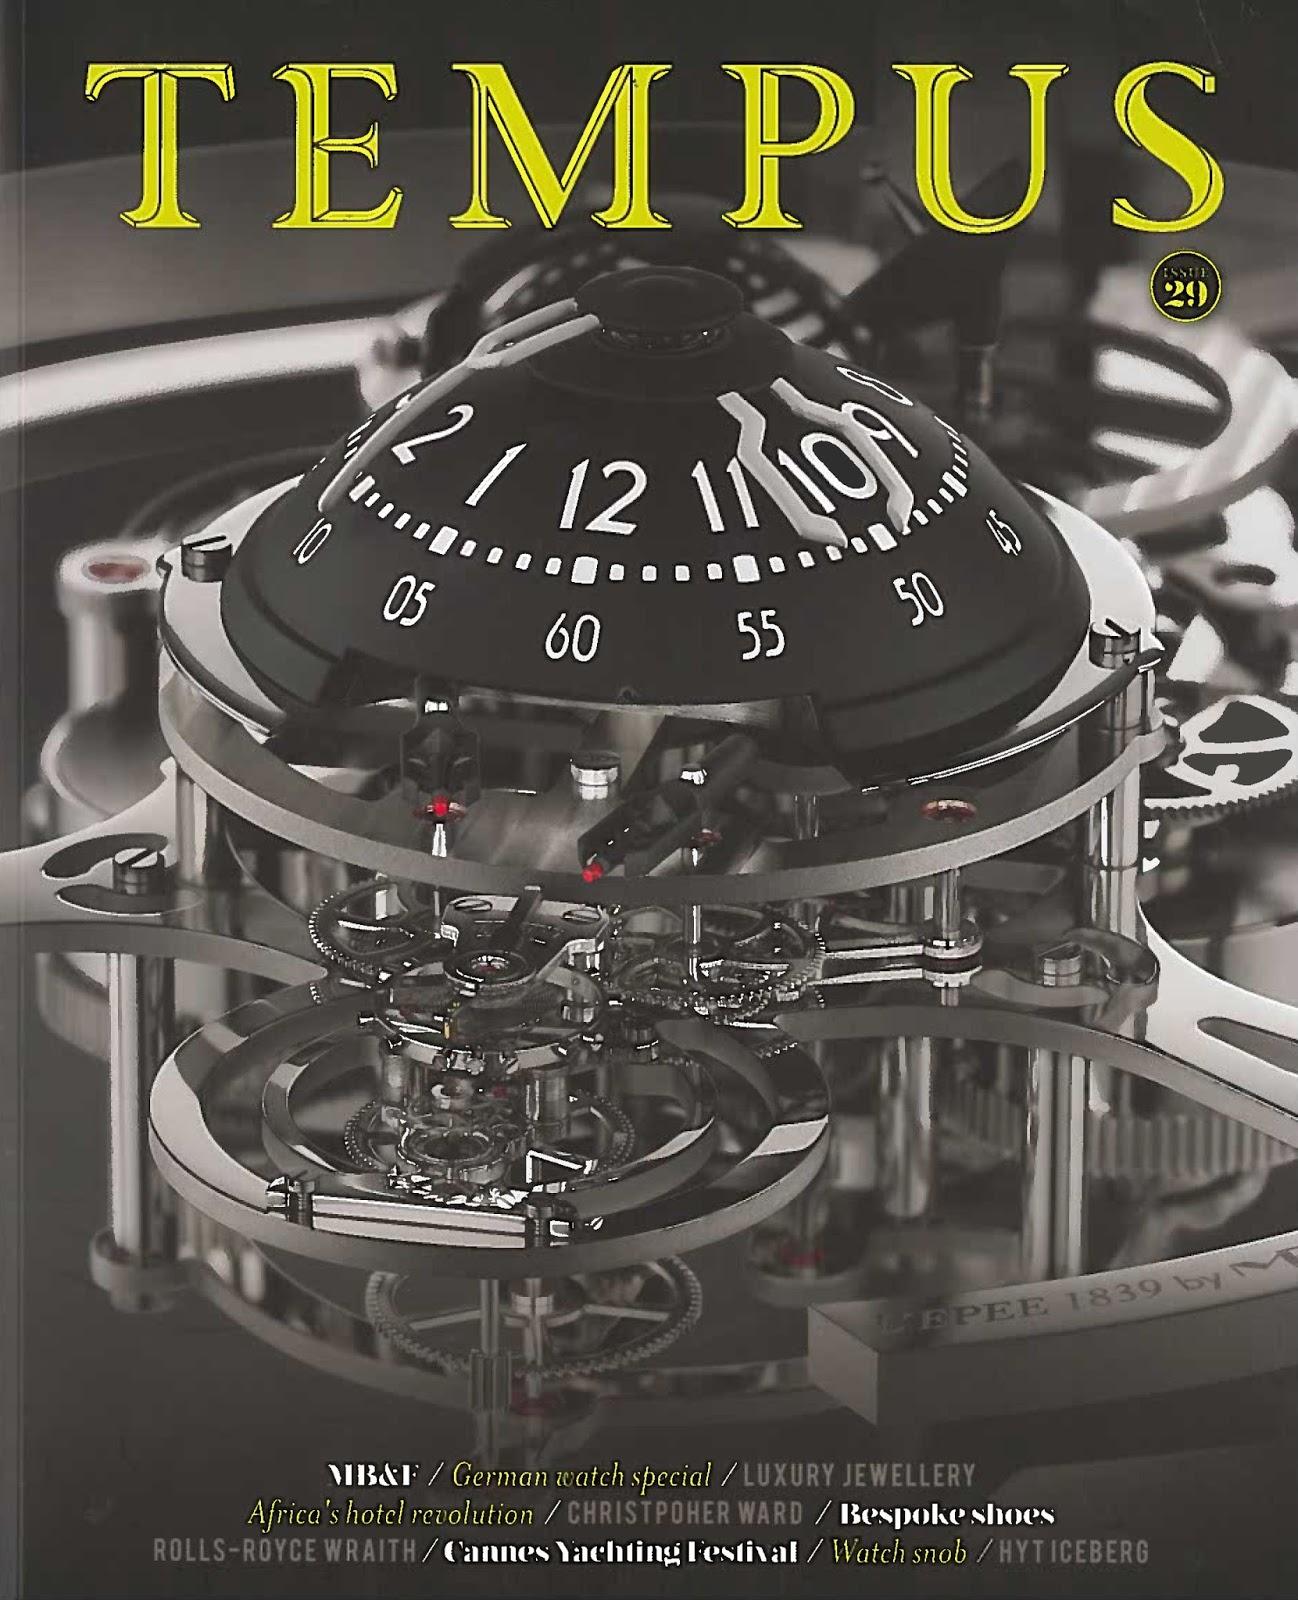 TEMPUS Magazine seeks fragrance & skincare news - PR Songbird